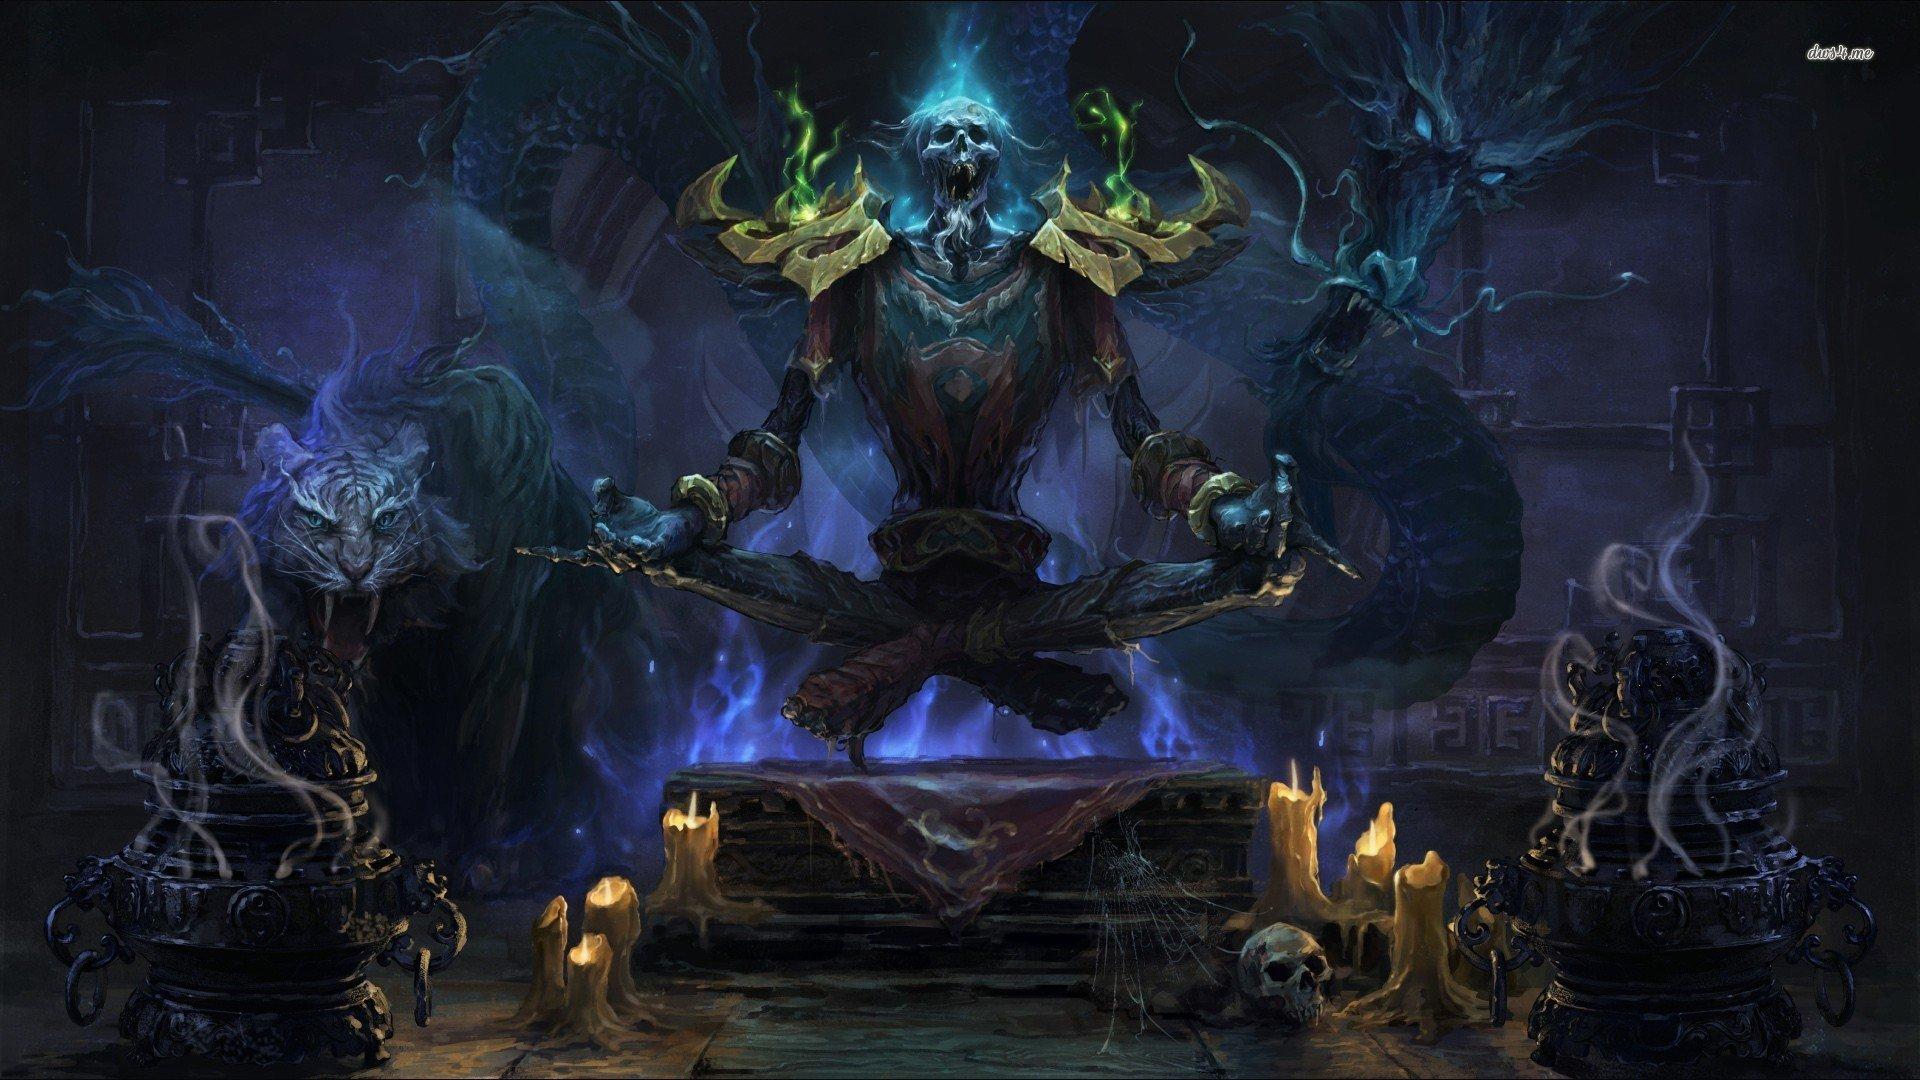 World Of Warcraft Backgrounds 1920x1080: [49+] WOW Druid Wallpaper On WallpaperSafari